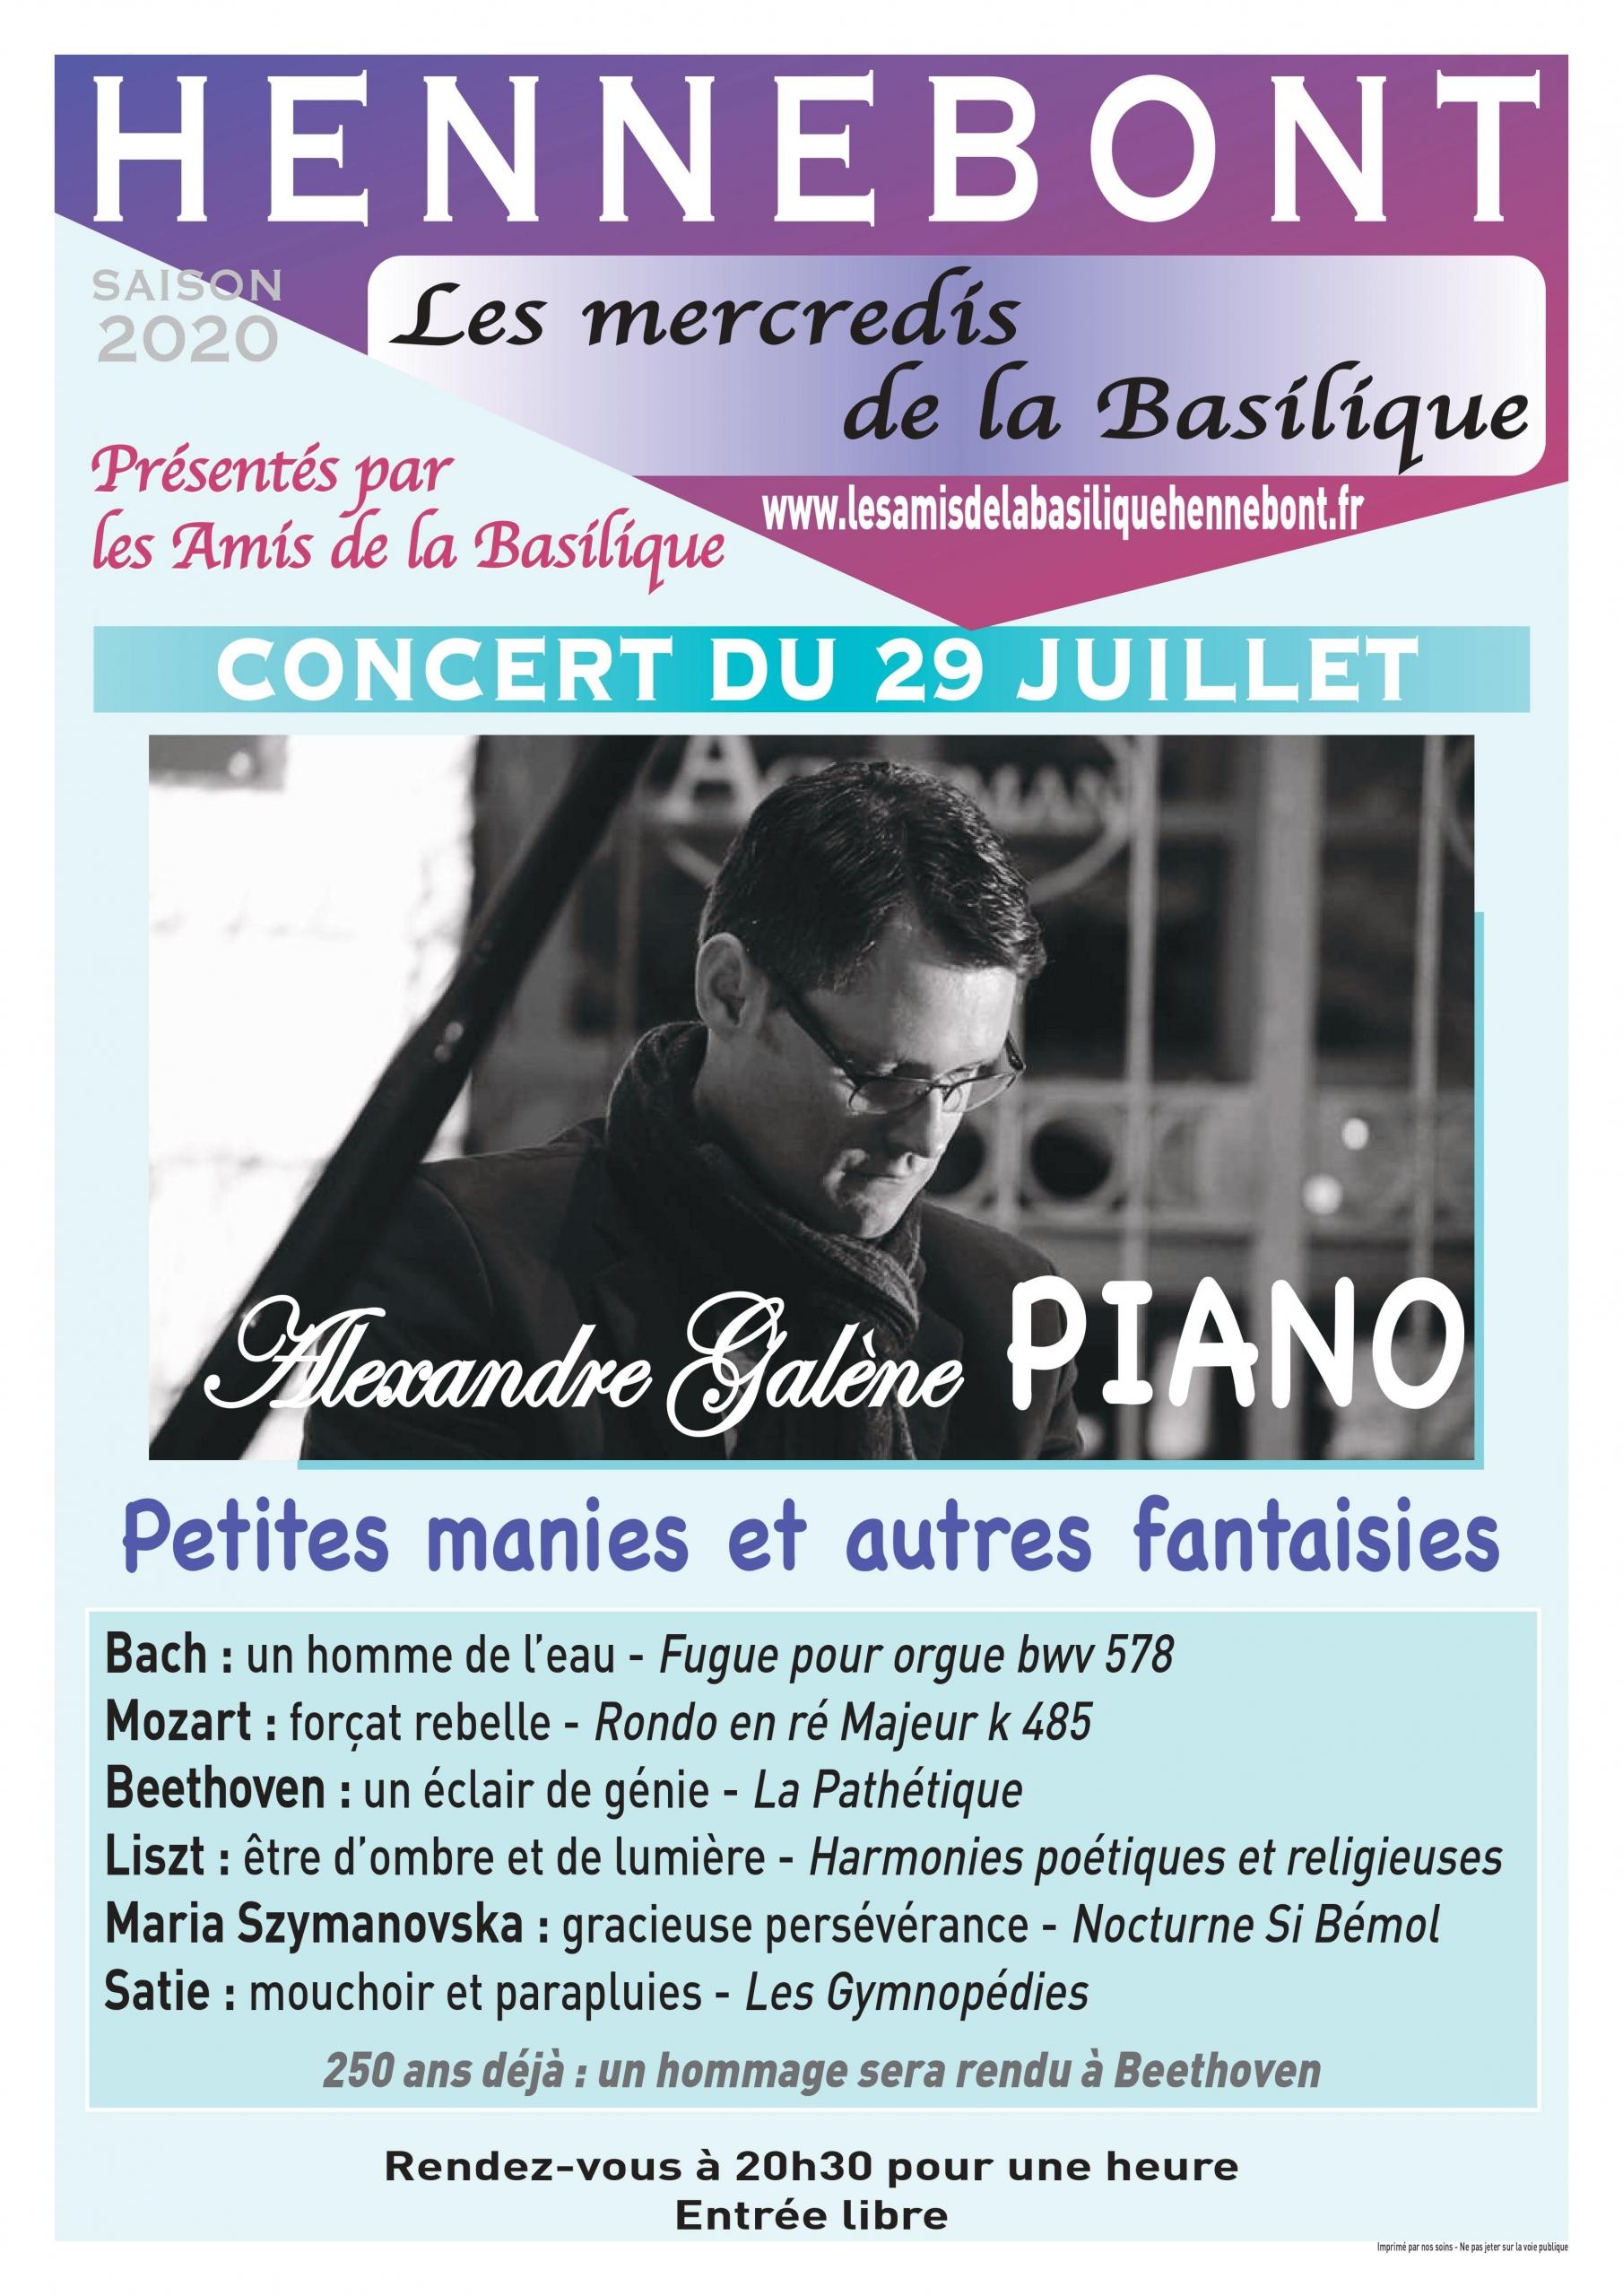 mercredis_de_la_basilique_concert_piano_alexandre_galene_hennebont